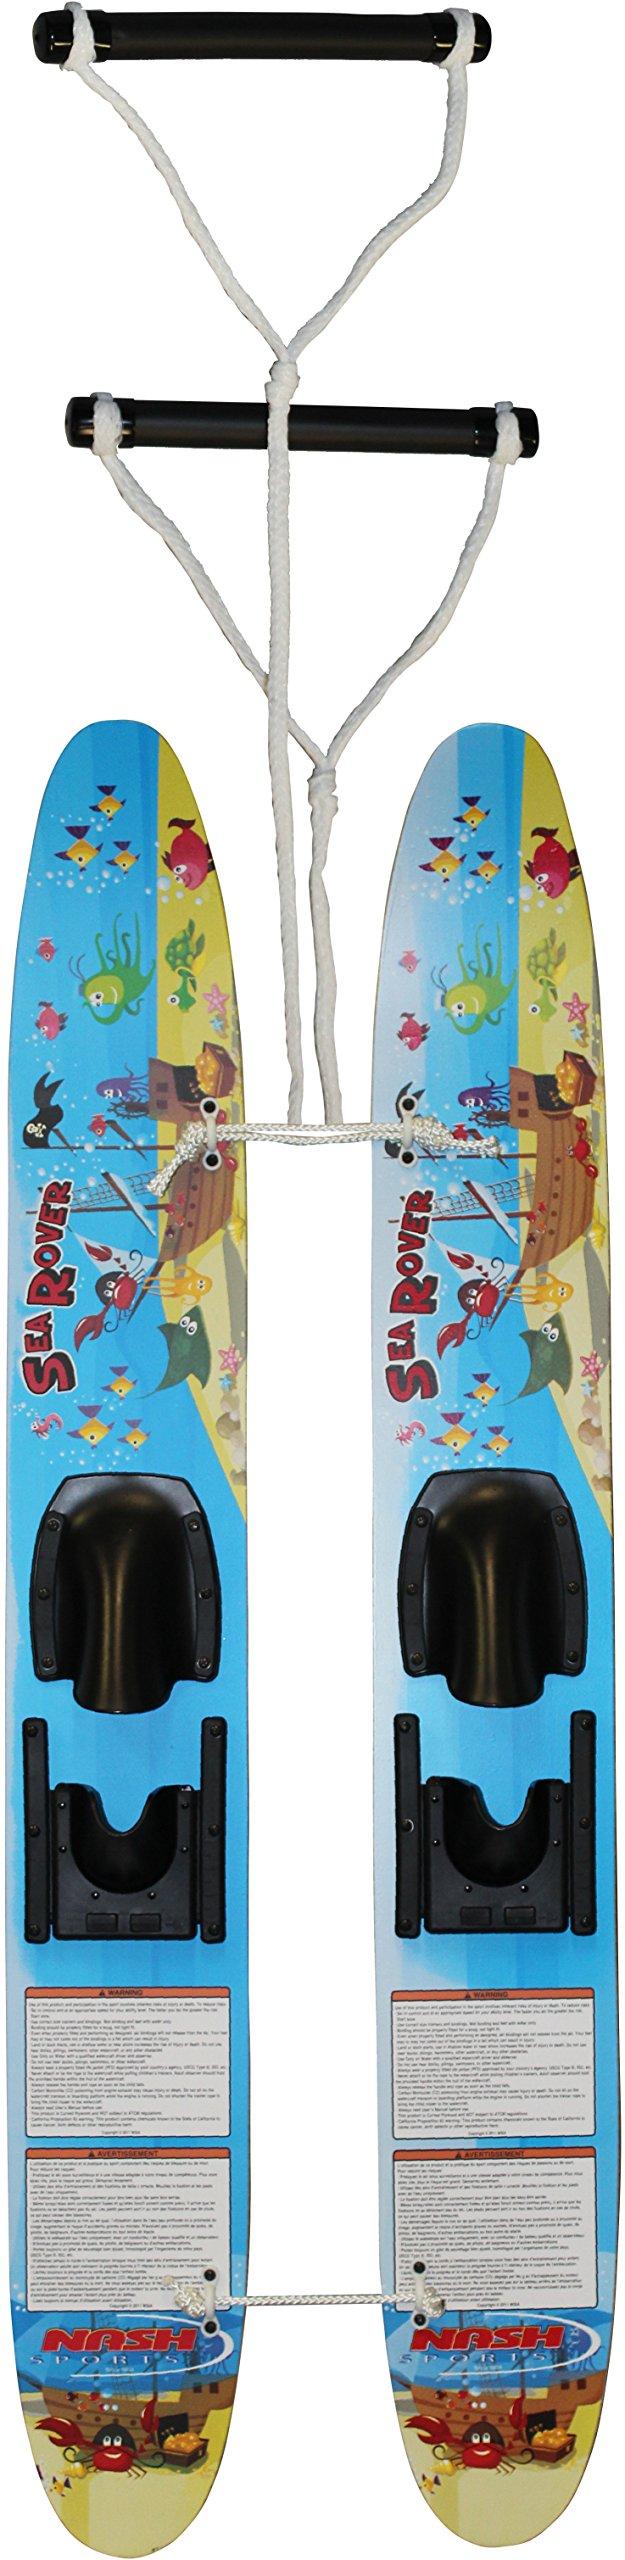 Hydroslide Kid's Trainer Water Skis, Blue, 48-Inch by Hydro Slide